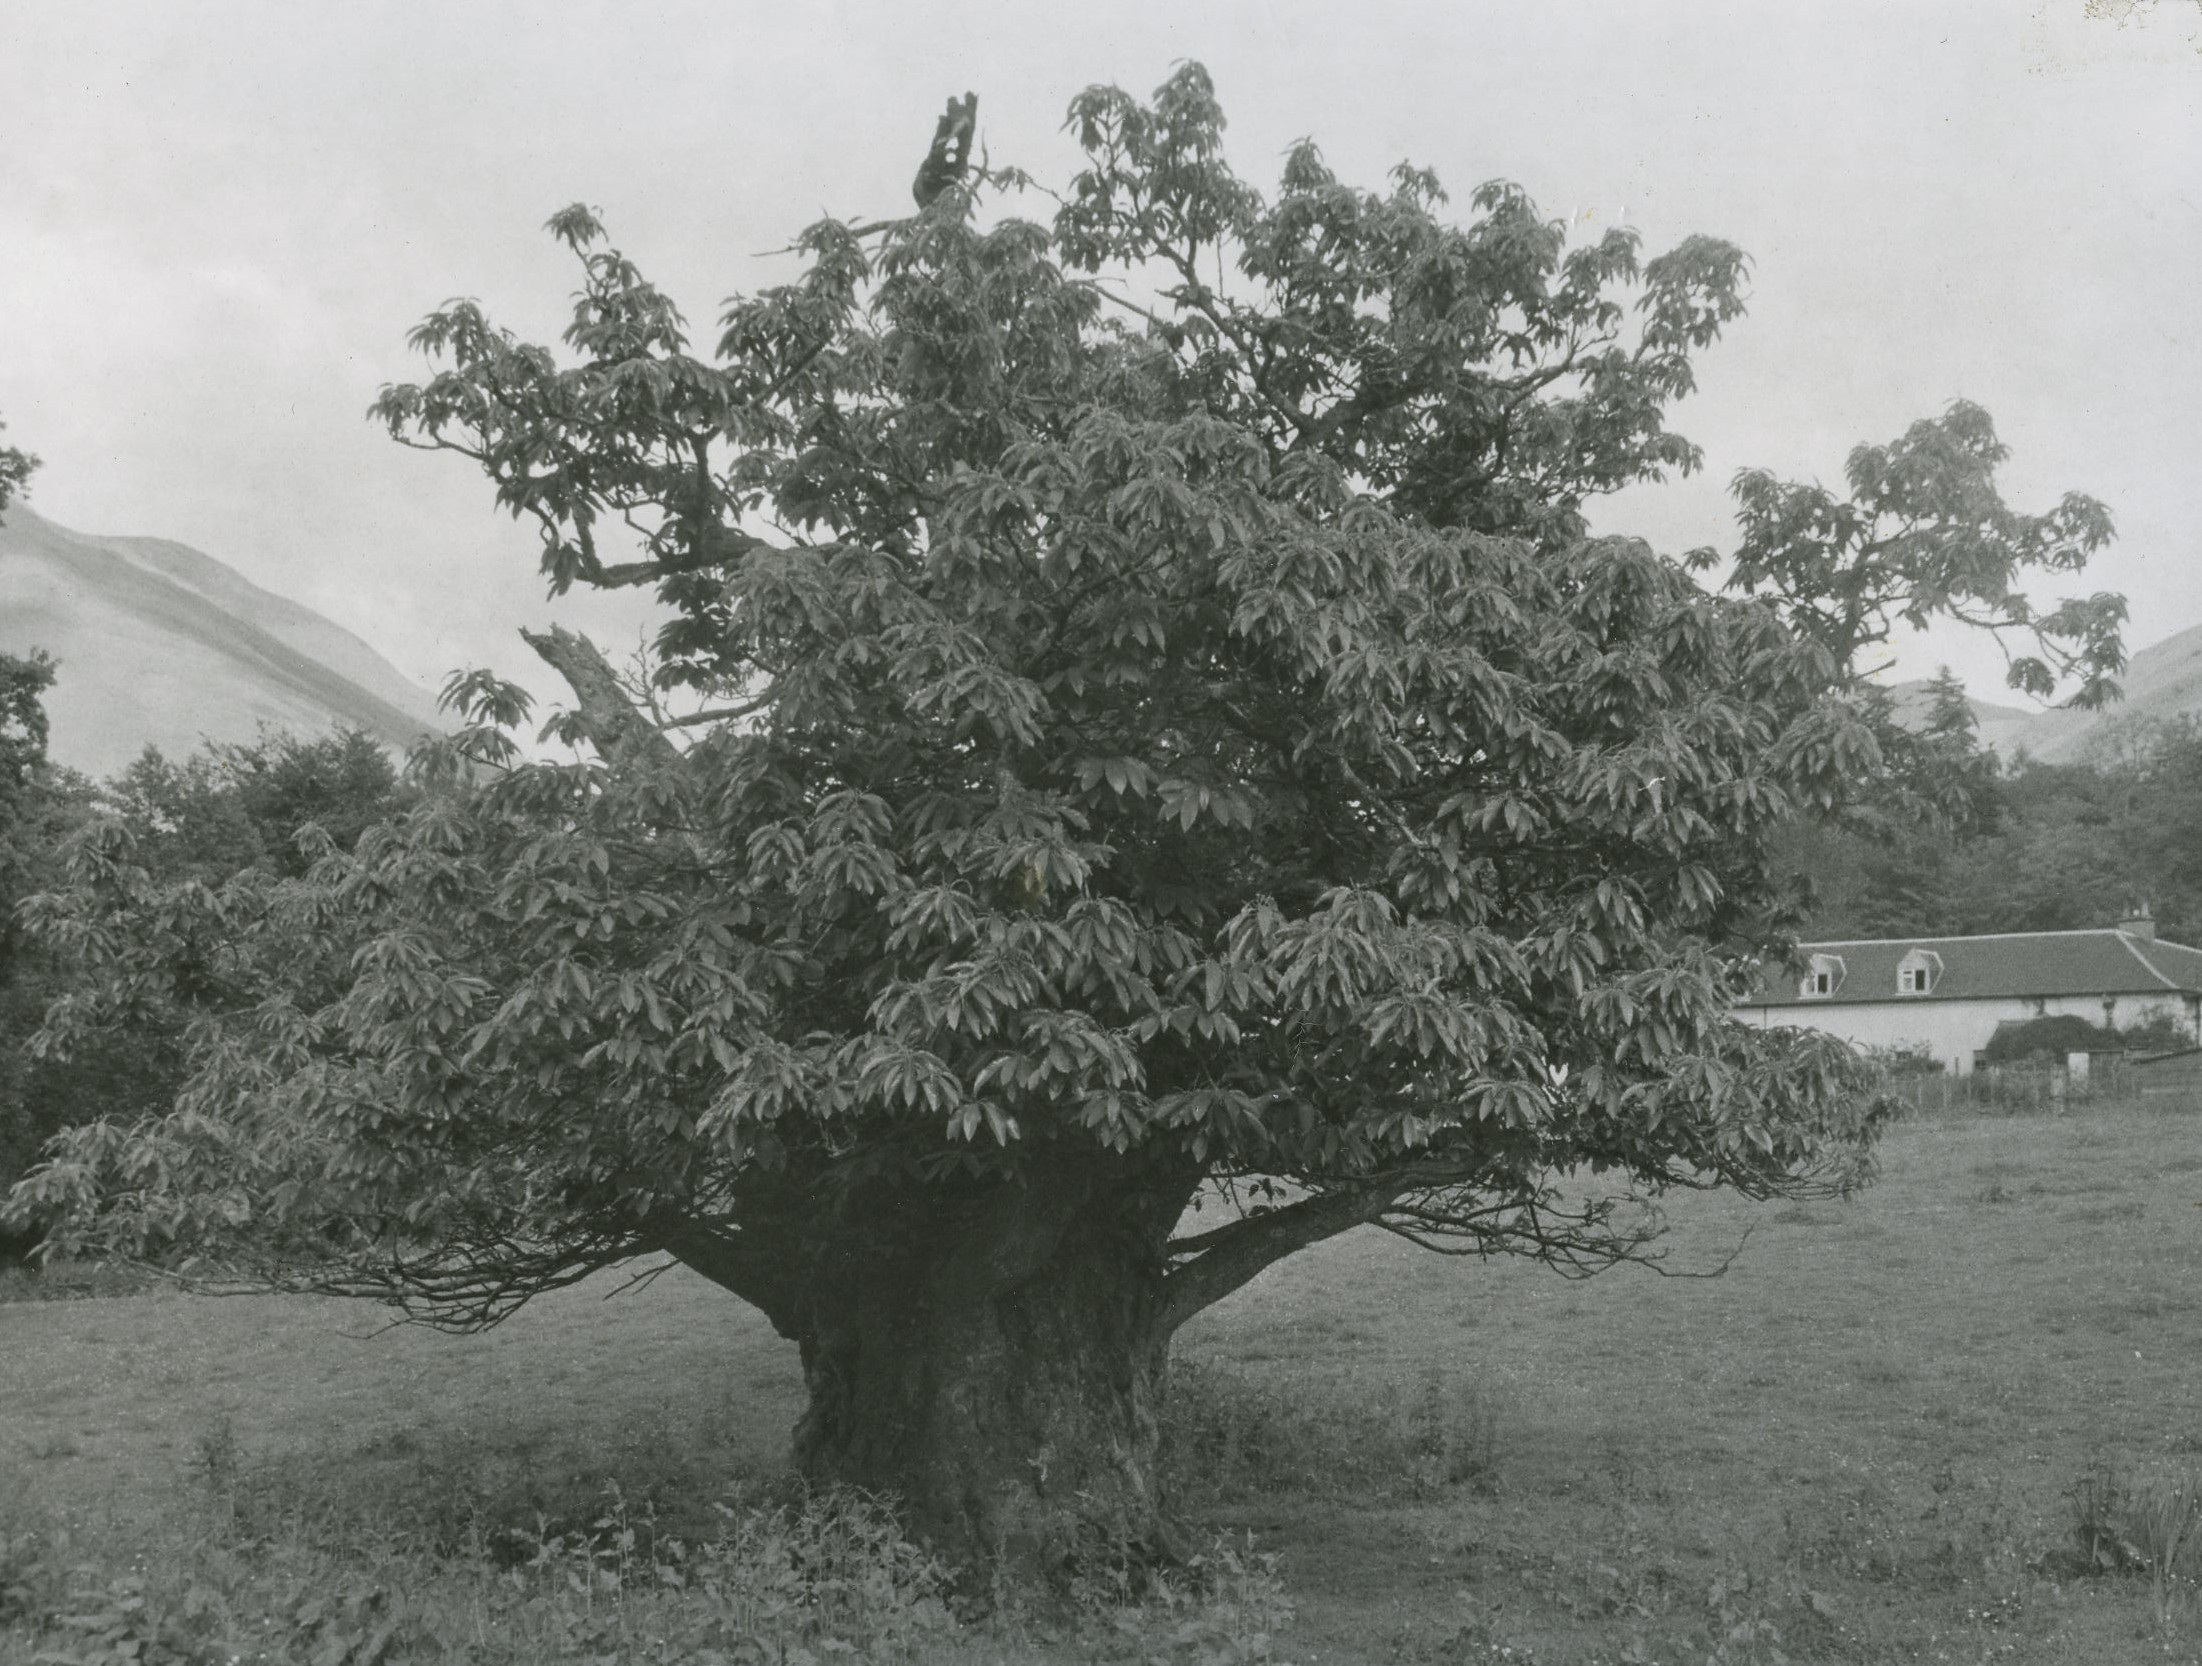 Chestnut Tree in Stable Field